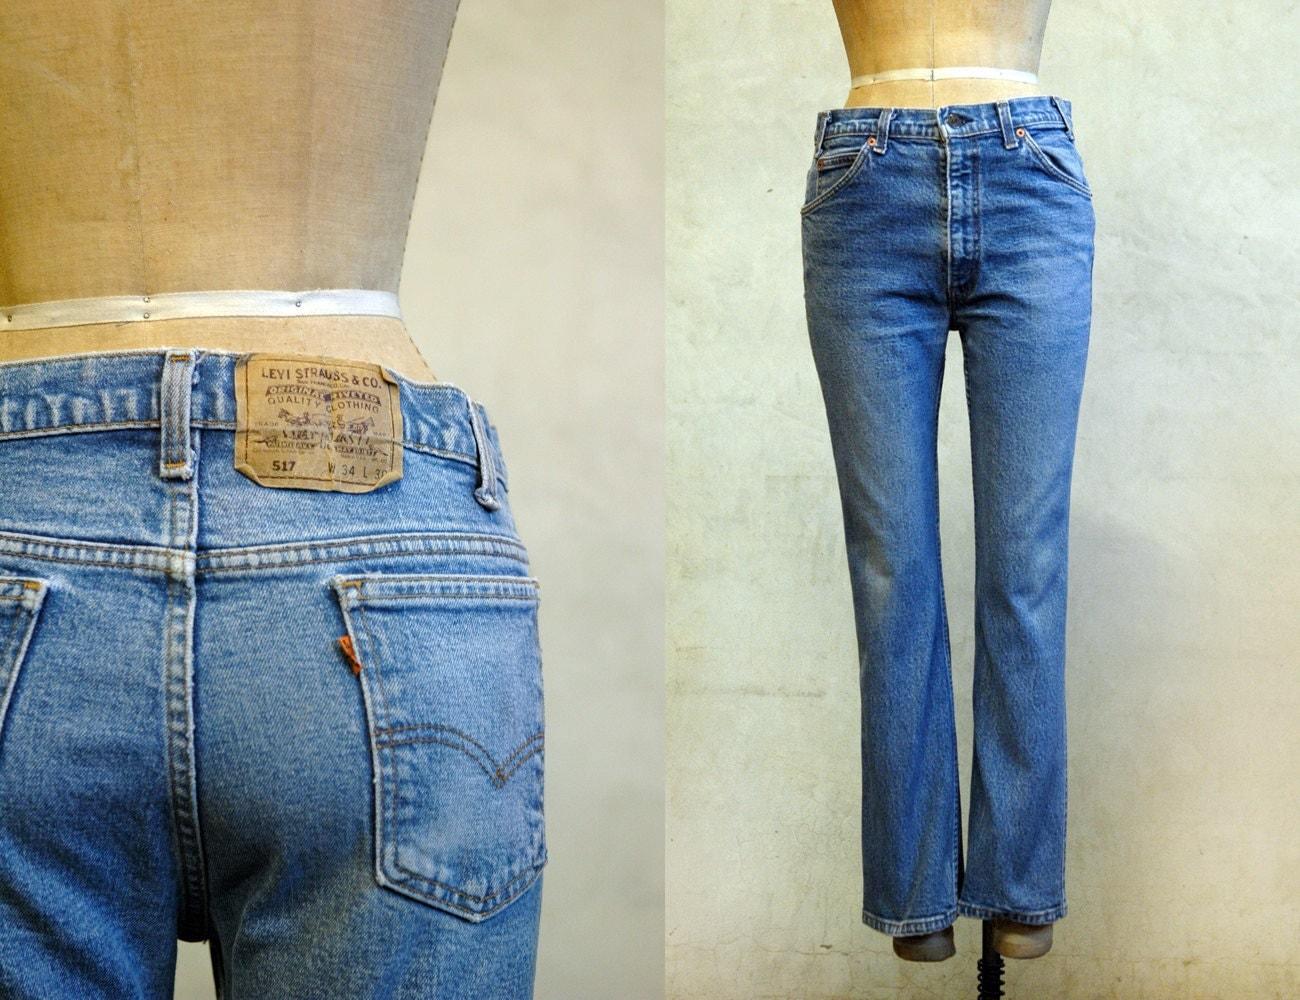 levis 517 denim jeans vintage 80s levis 33x28. Black Bedroom Furniture Sets. Home Design Ideas